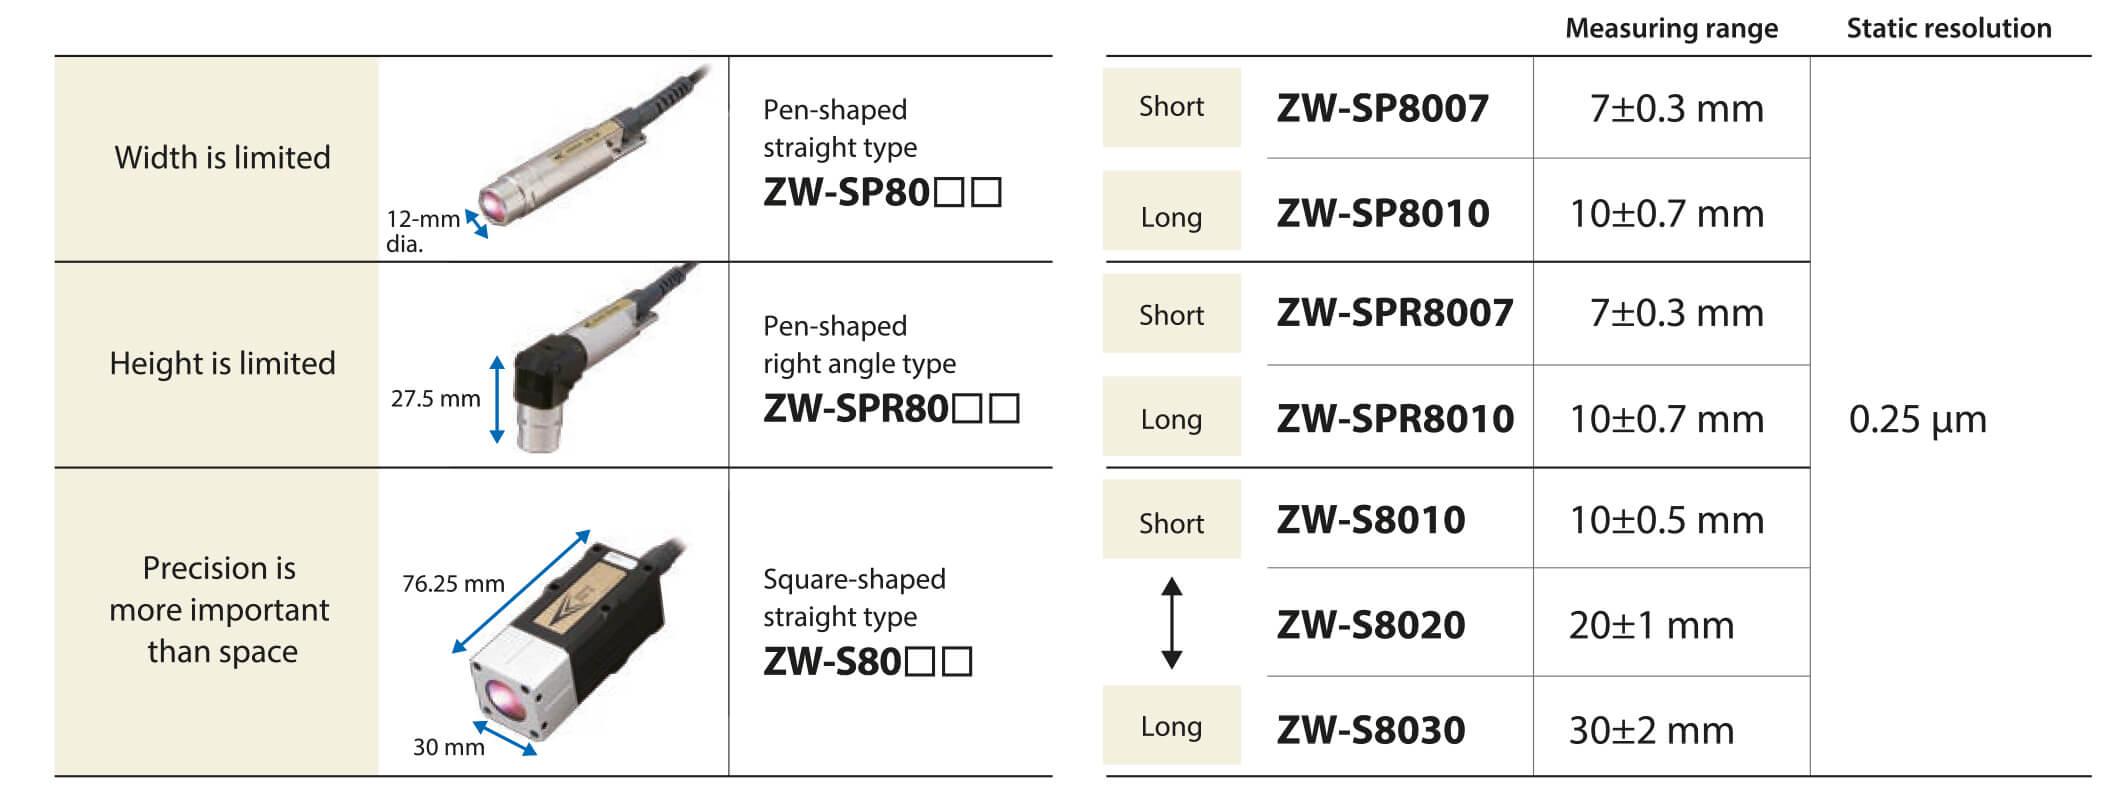 sensor controller zw-8000t table en prod